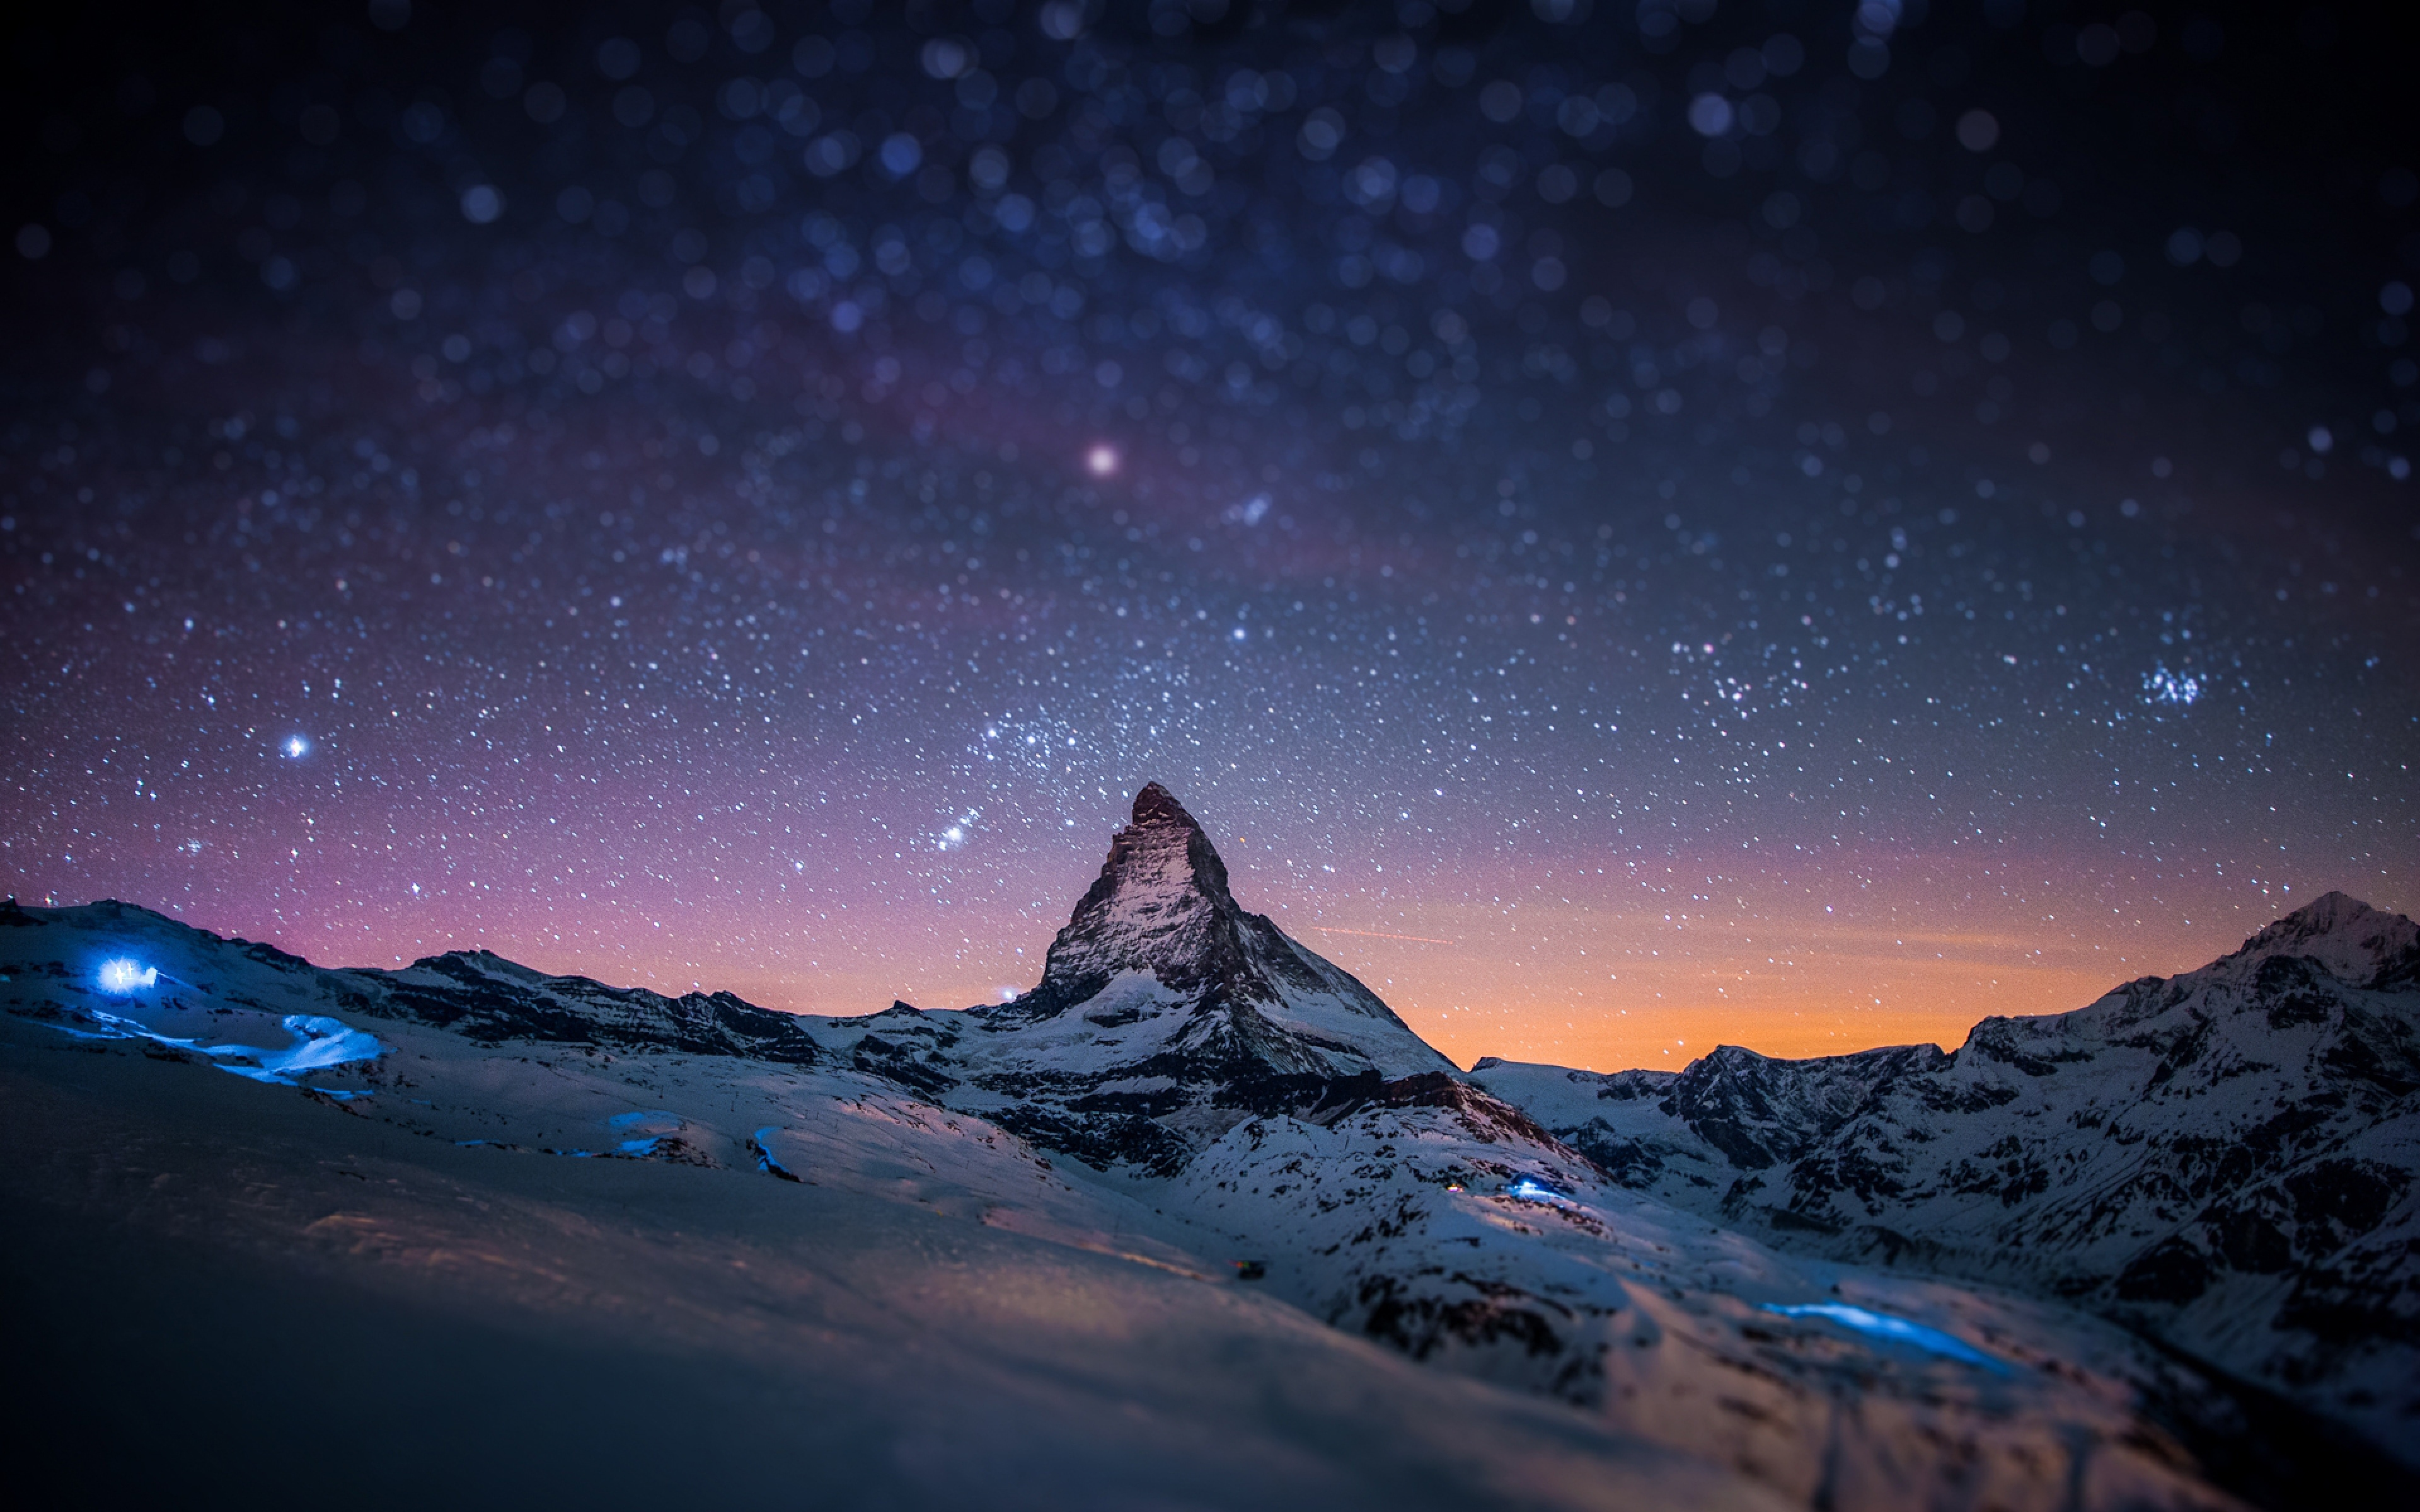 Night Sky Blurred Stars Light Show Wallpaper WallpapersByte 3840x2400